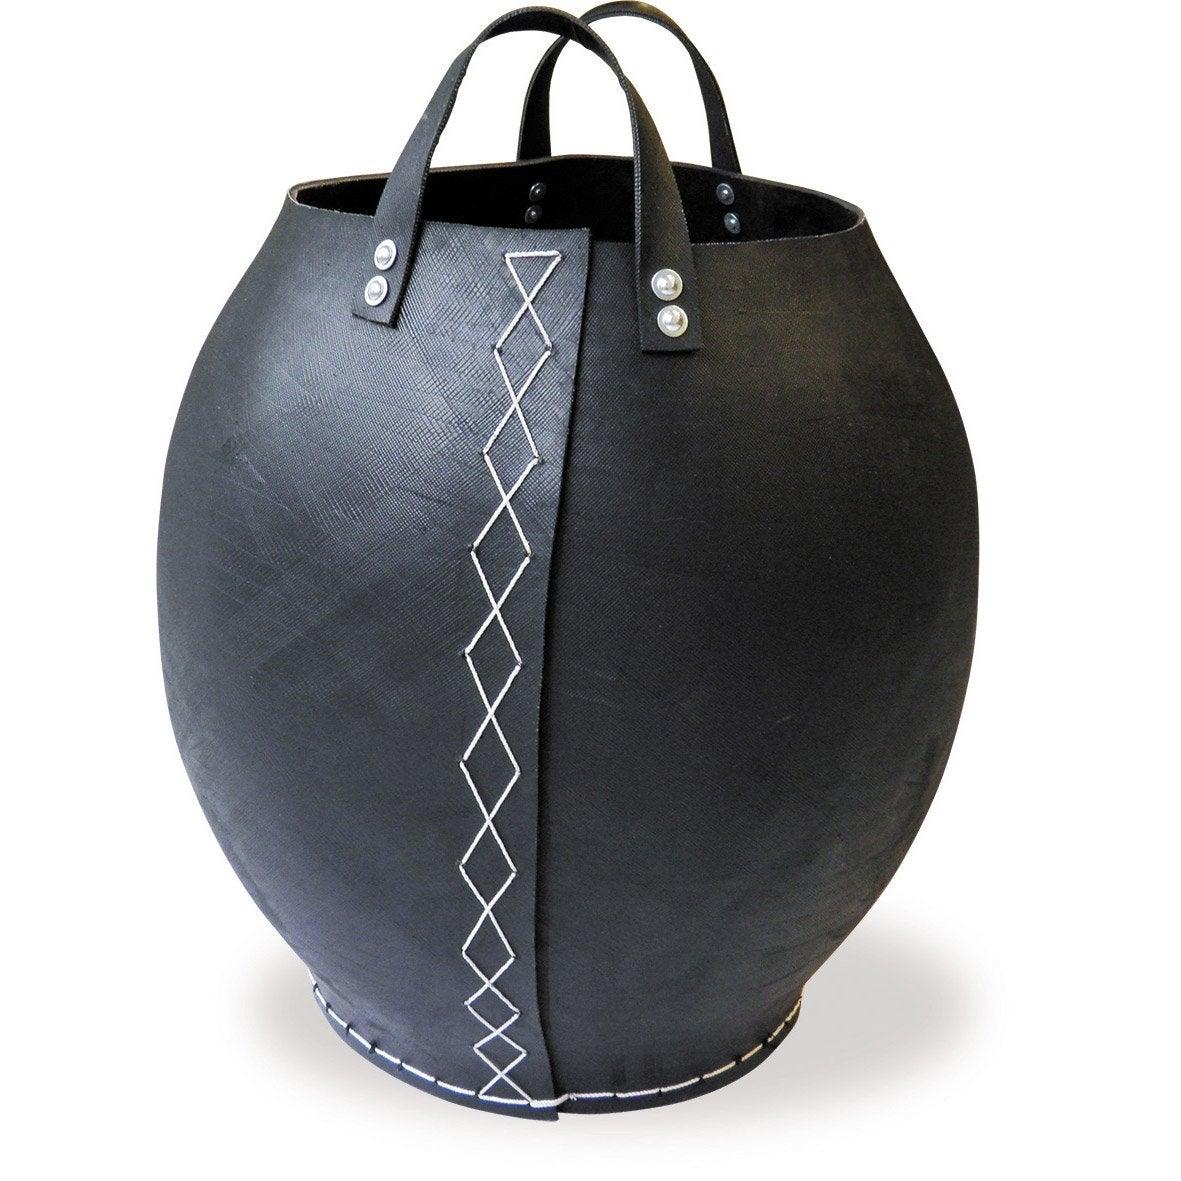 Panier granules simili cuir tayara noir leroy merlin - Granule leroy merlin ...